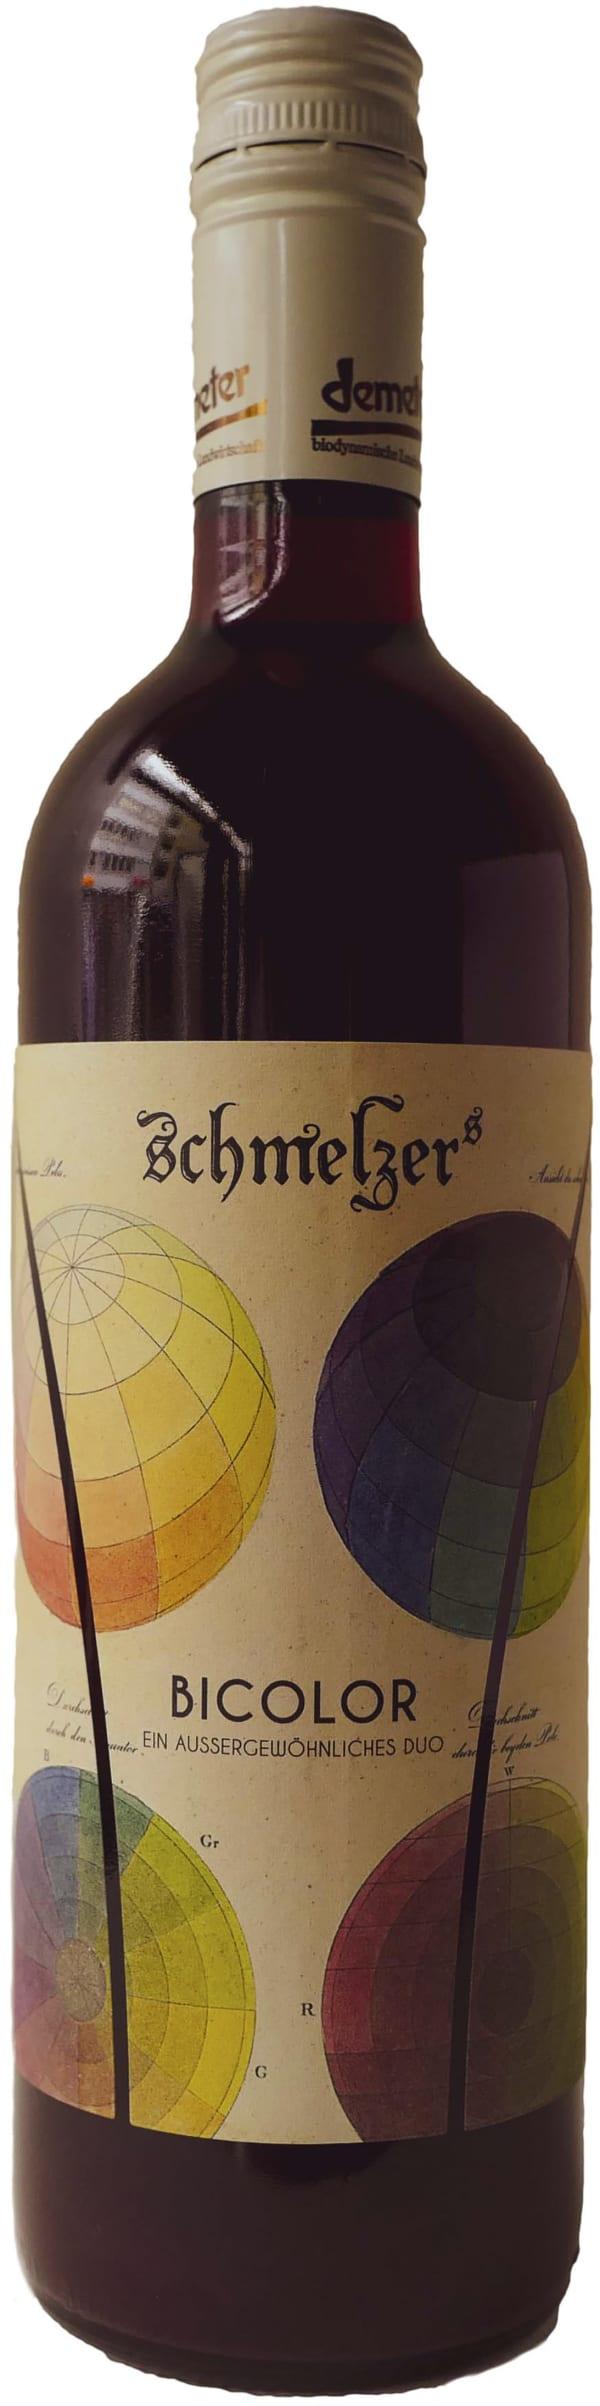 Schmelzer Bicolor